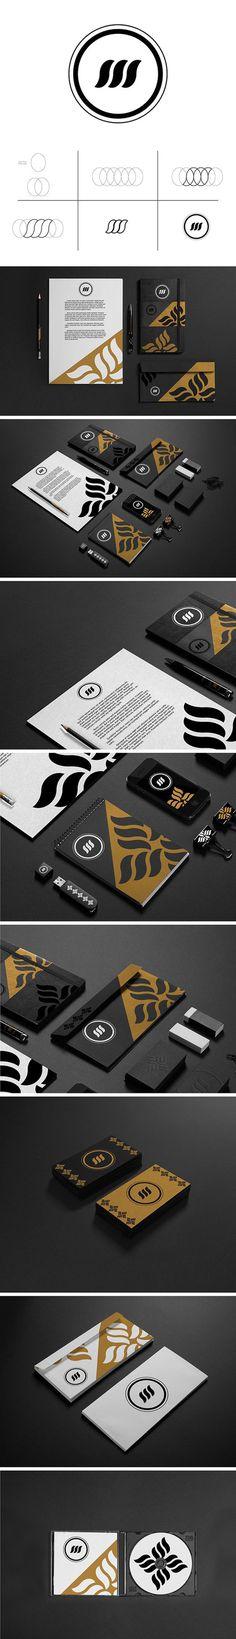 M logo // branding // identity #logo #branding #design #identity #symbol #mockup #corporate #work #new #concept